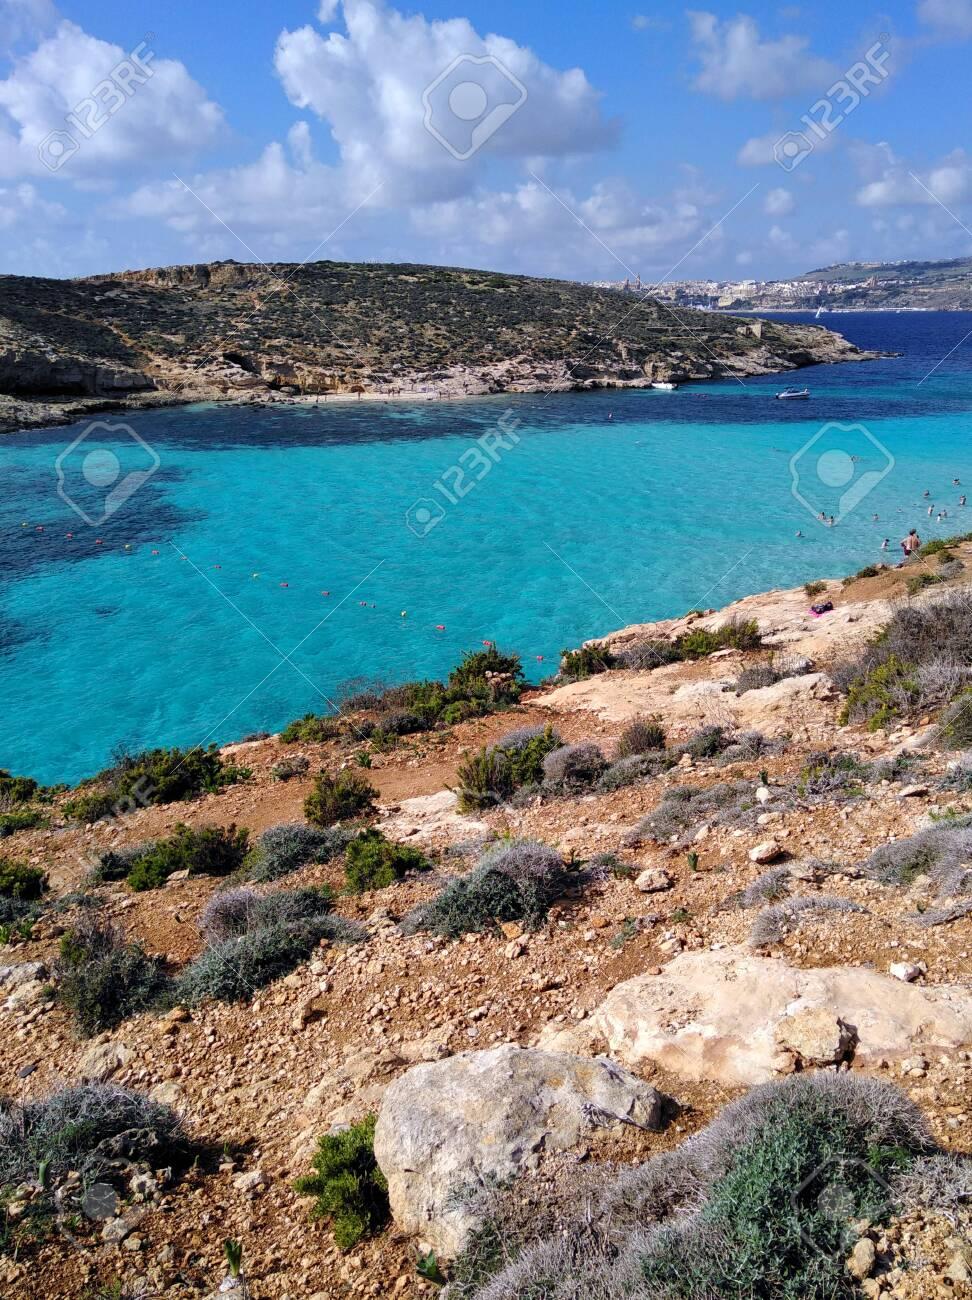 Comino Island Blue Lagoon Malta Blue Turquoise Sea Water Beach